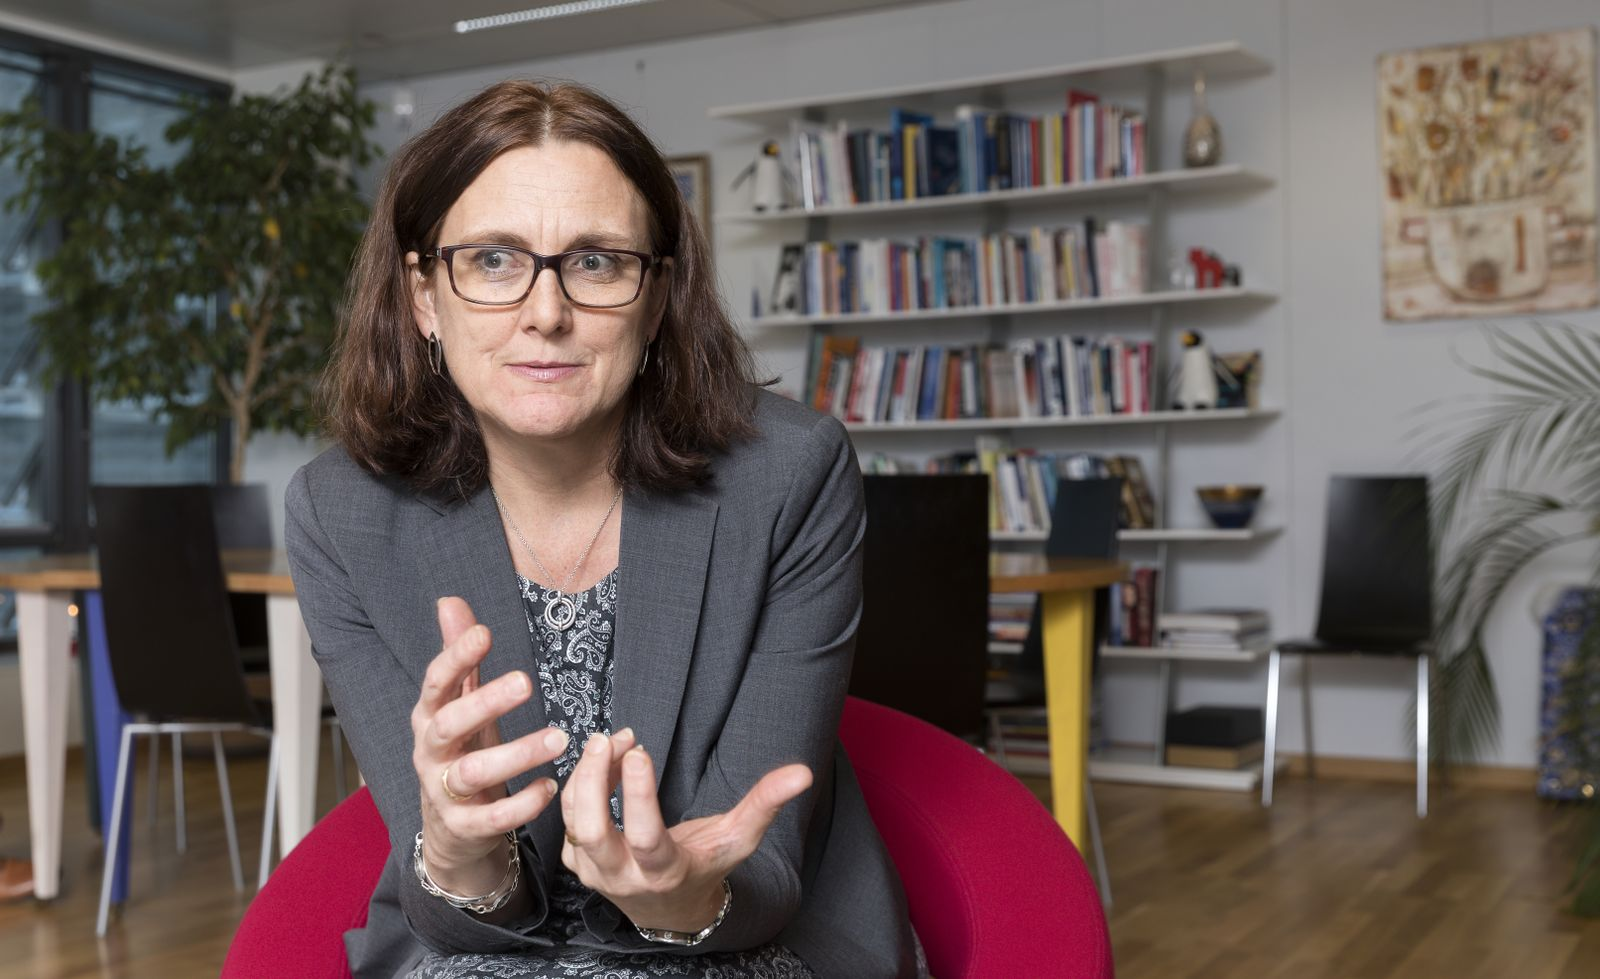 Freihandelszone/ Cecilia Malmström